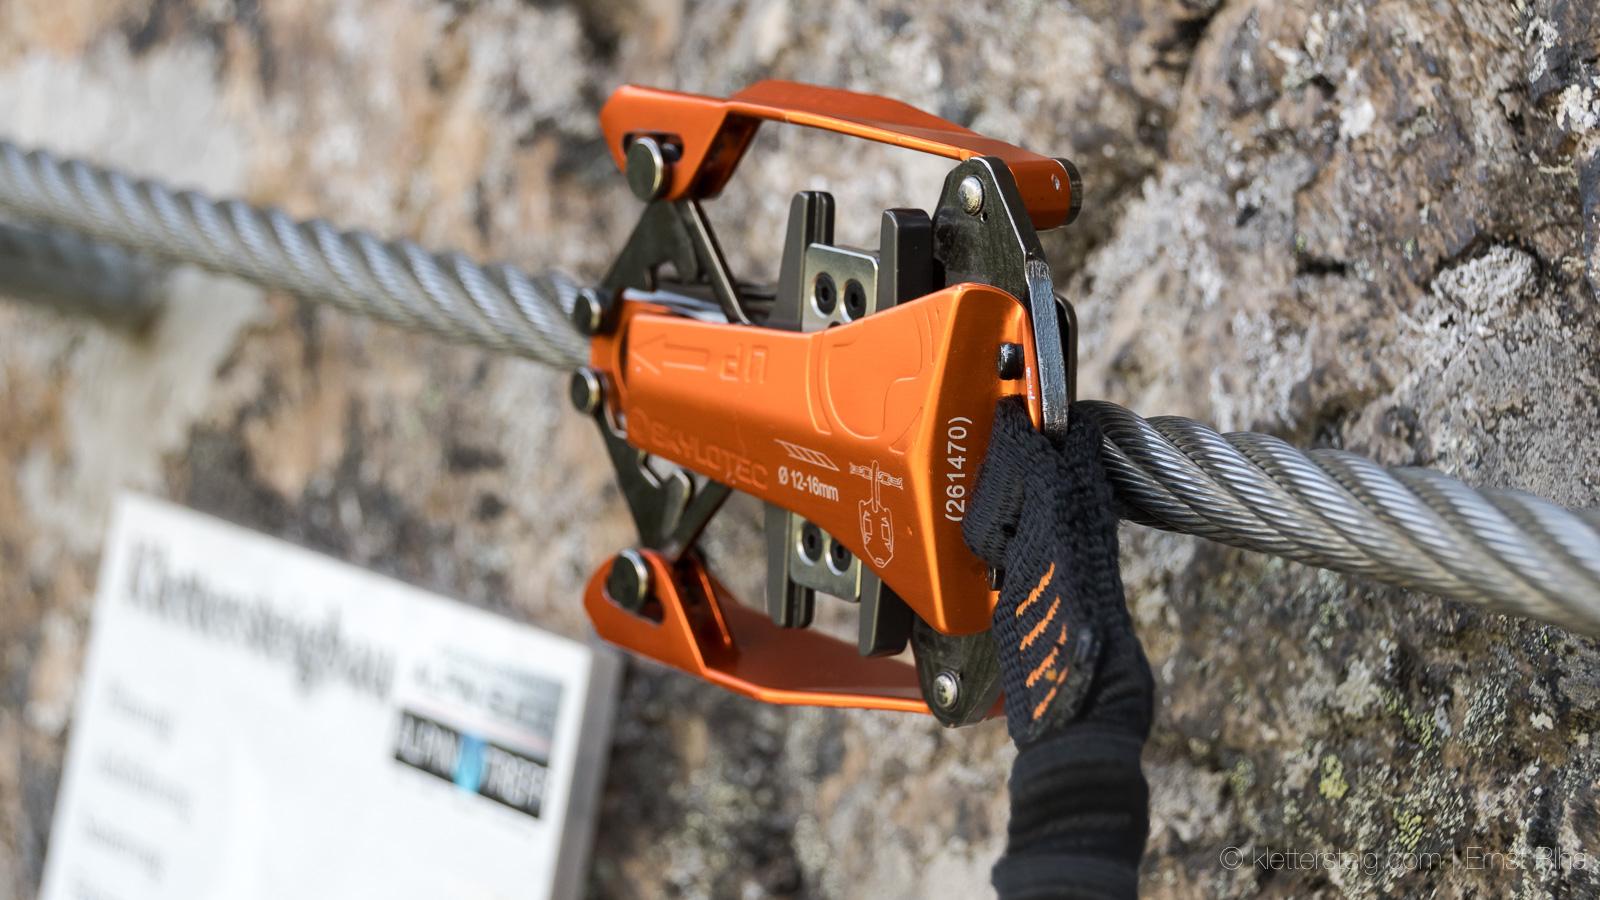 Klettersteig Set : Rückruf klettersteigset skylotec klettersteige